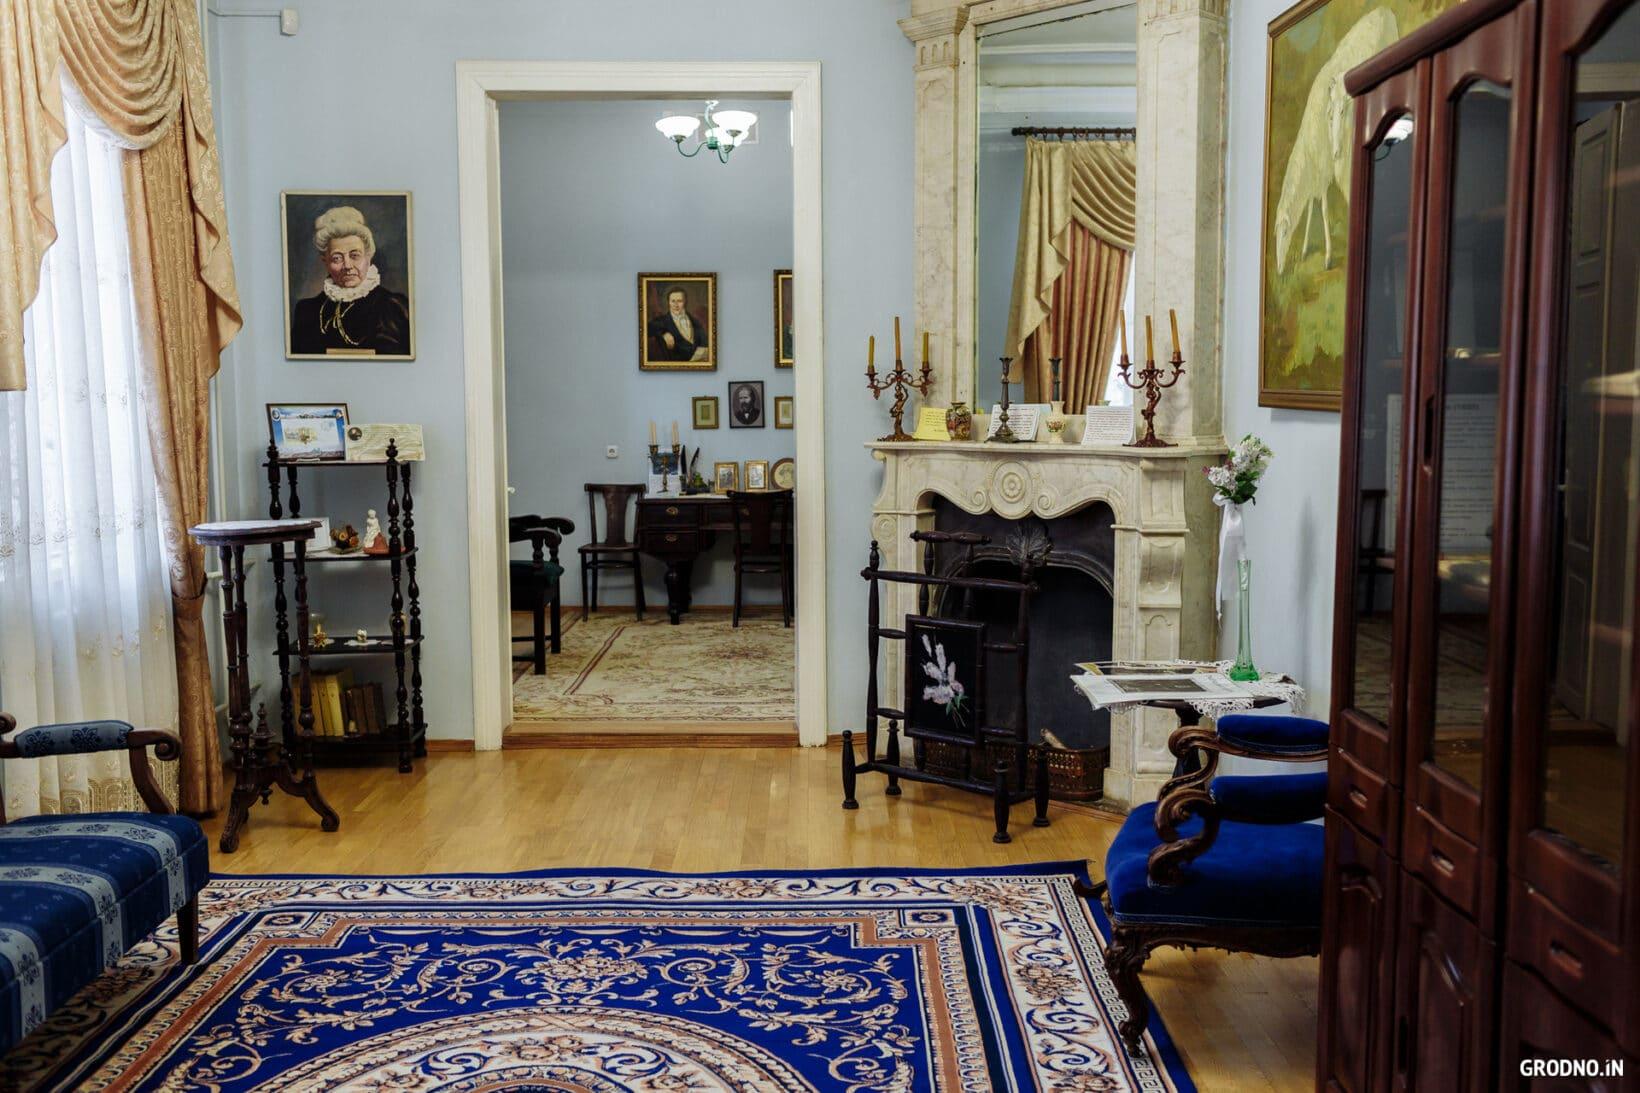 19th century museum in Grodno